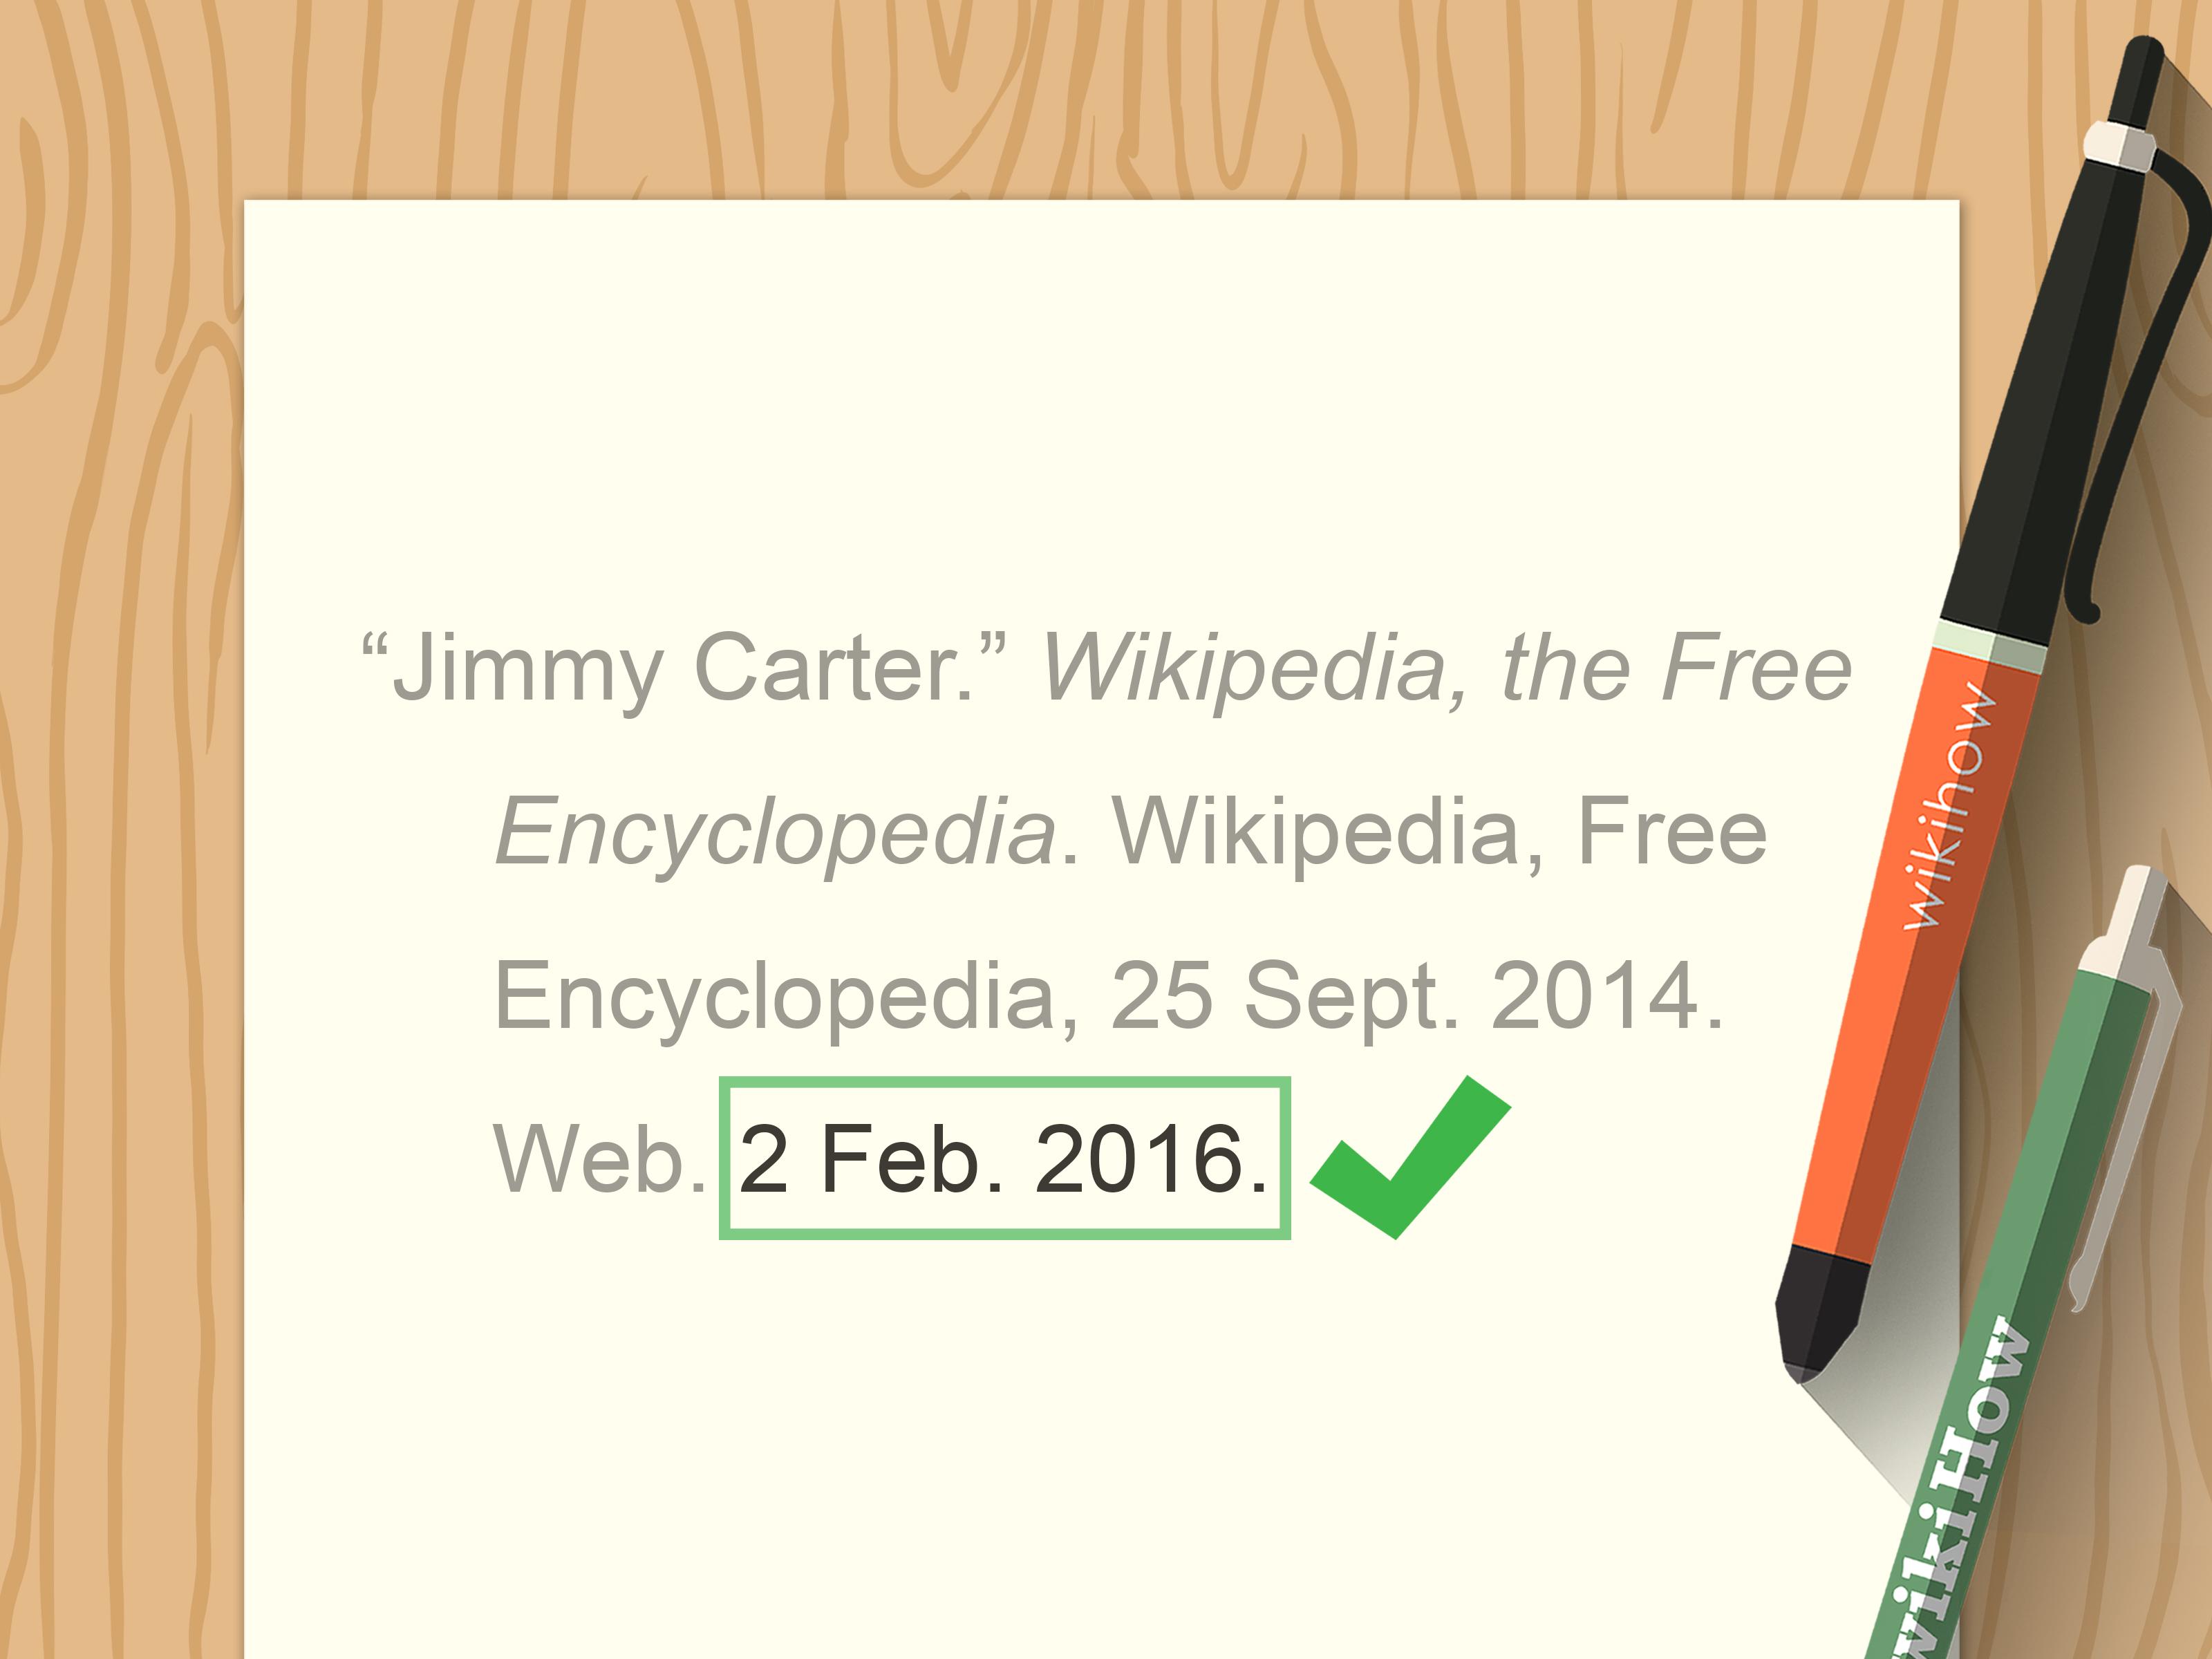 4 Ways to Cite Wikipedia - wikiHow